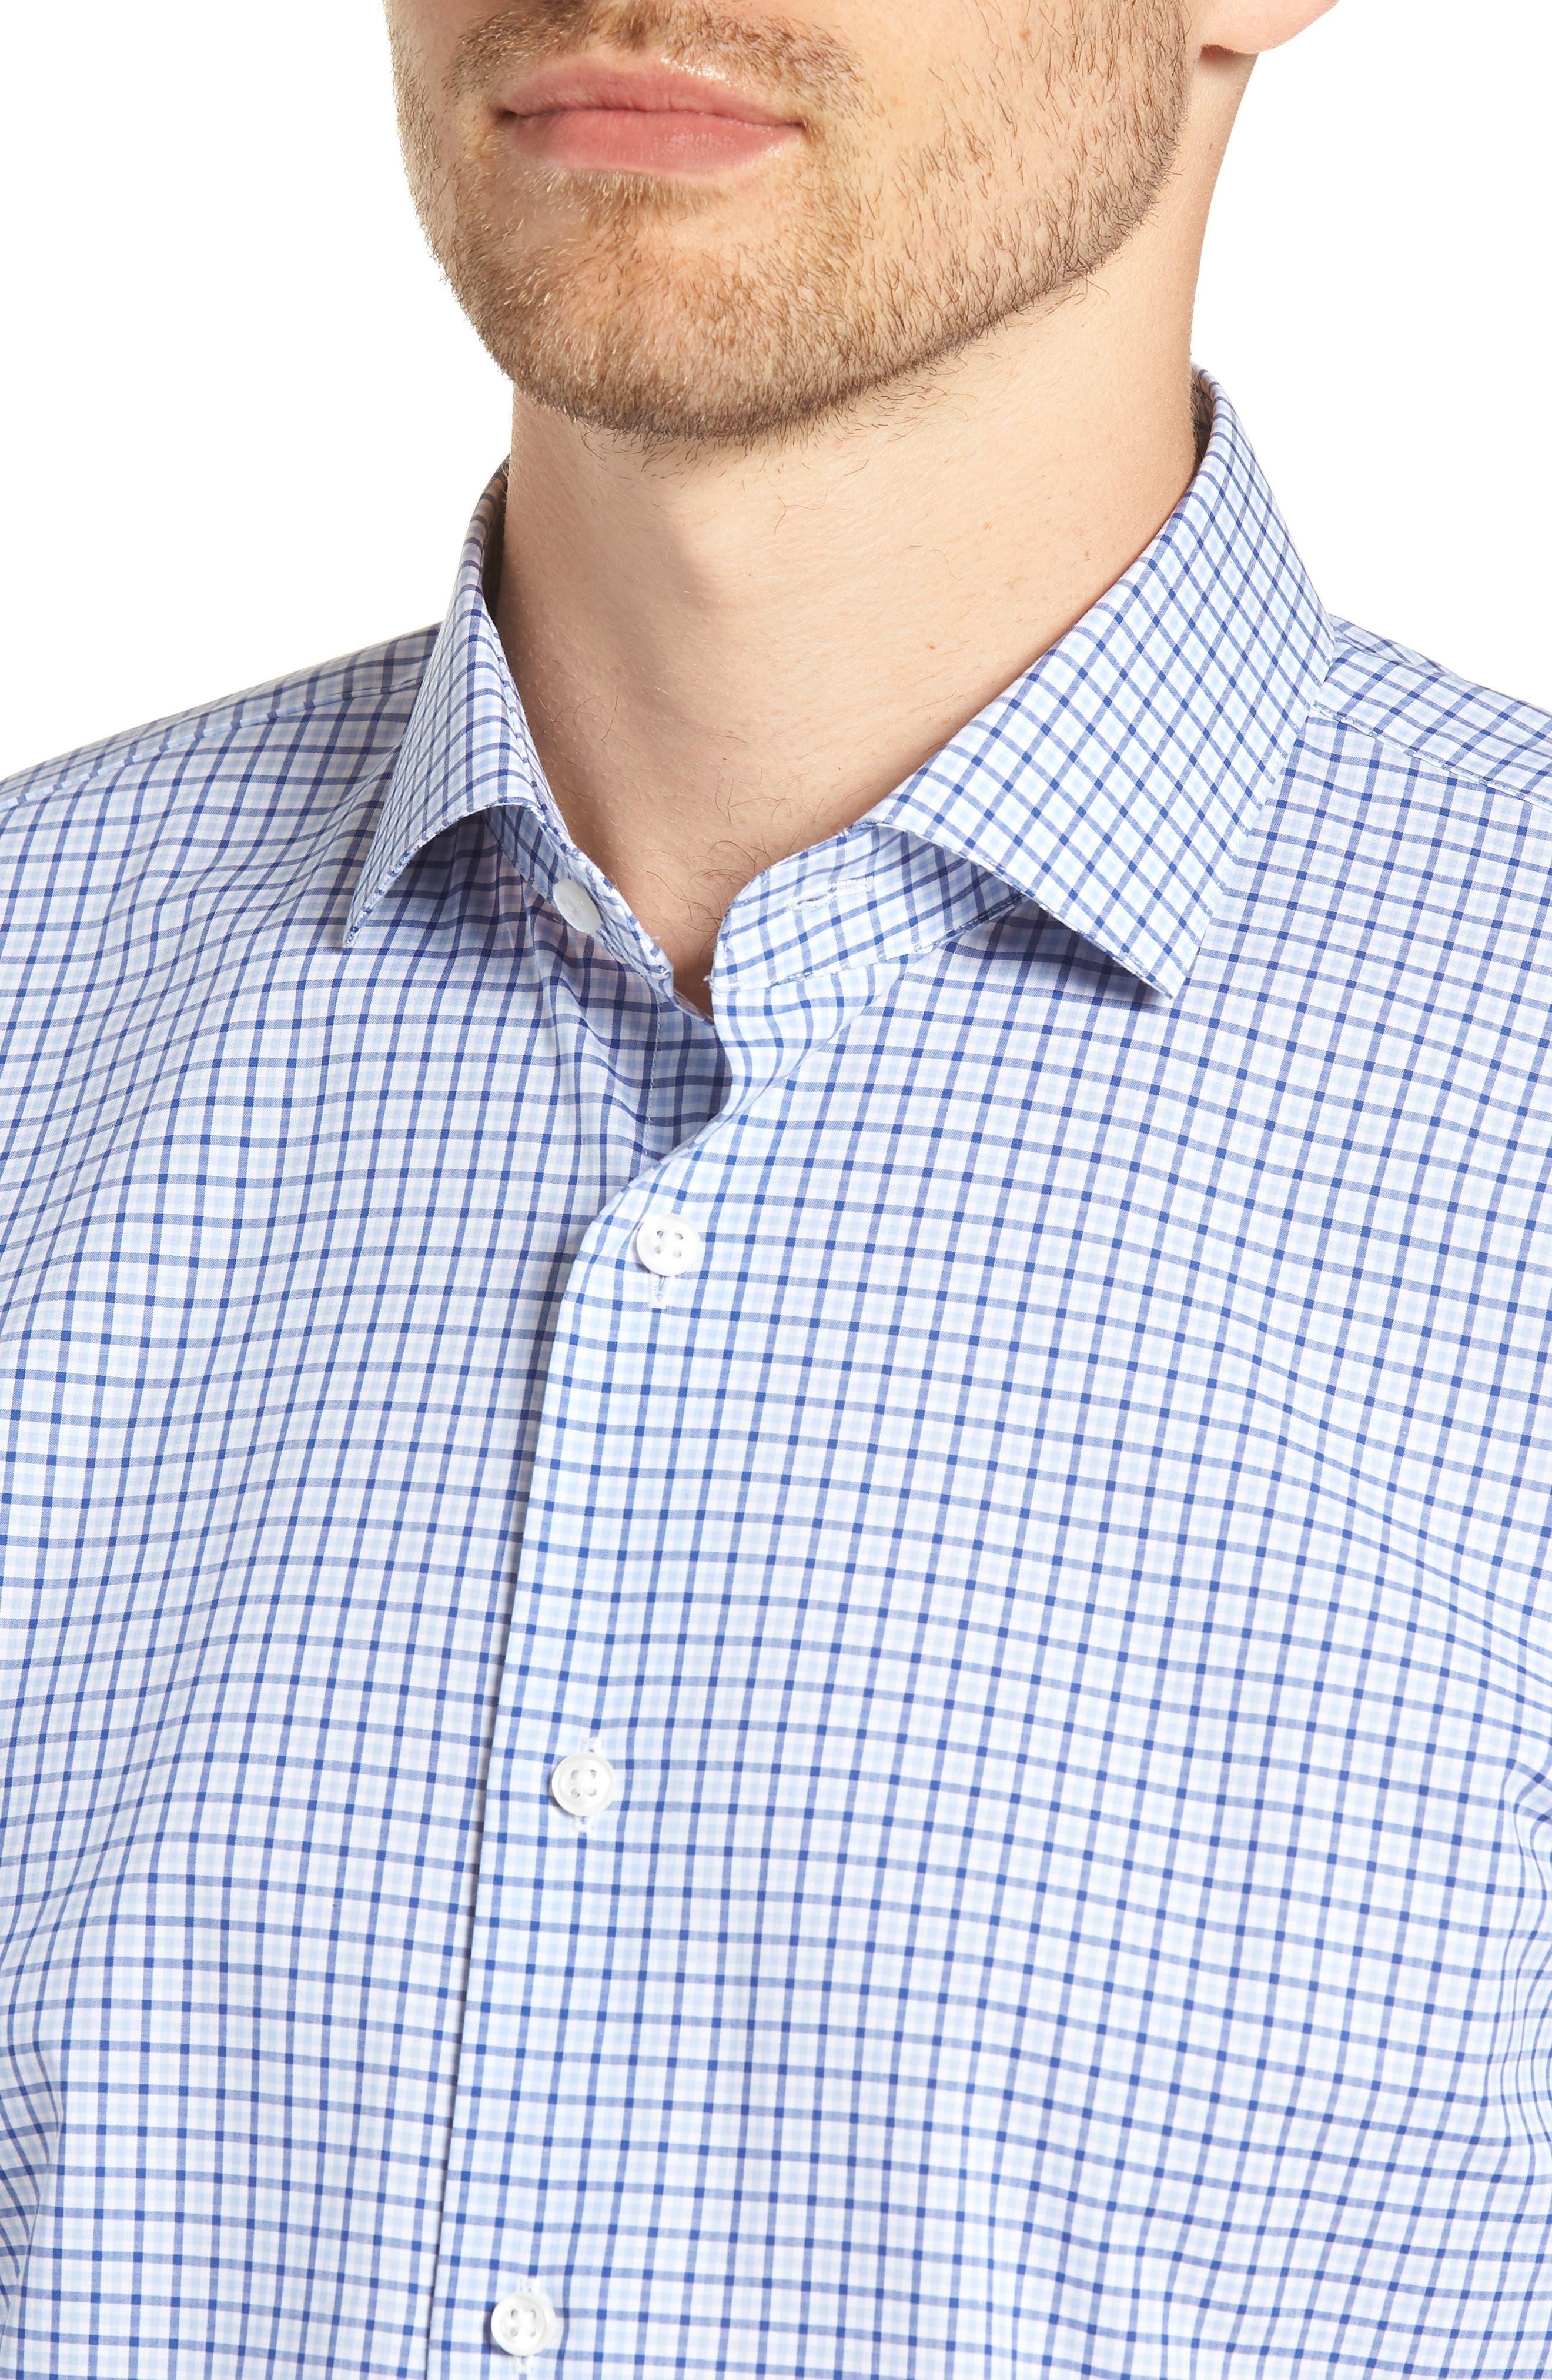 Trim Fit Check Dress Shirt,                             Alternate thumbnail 2, color,                             BLUE SODALITE